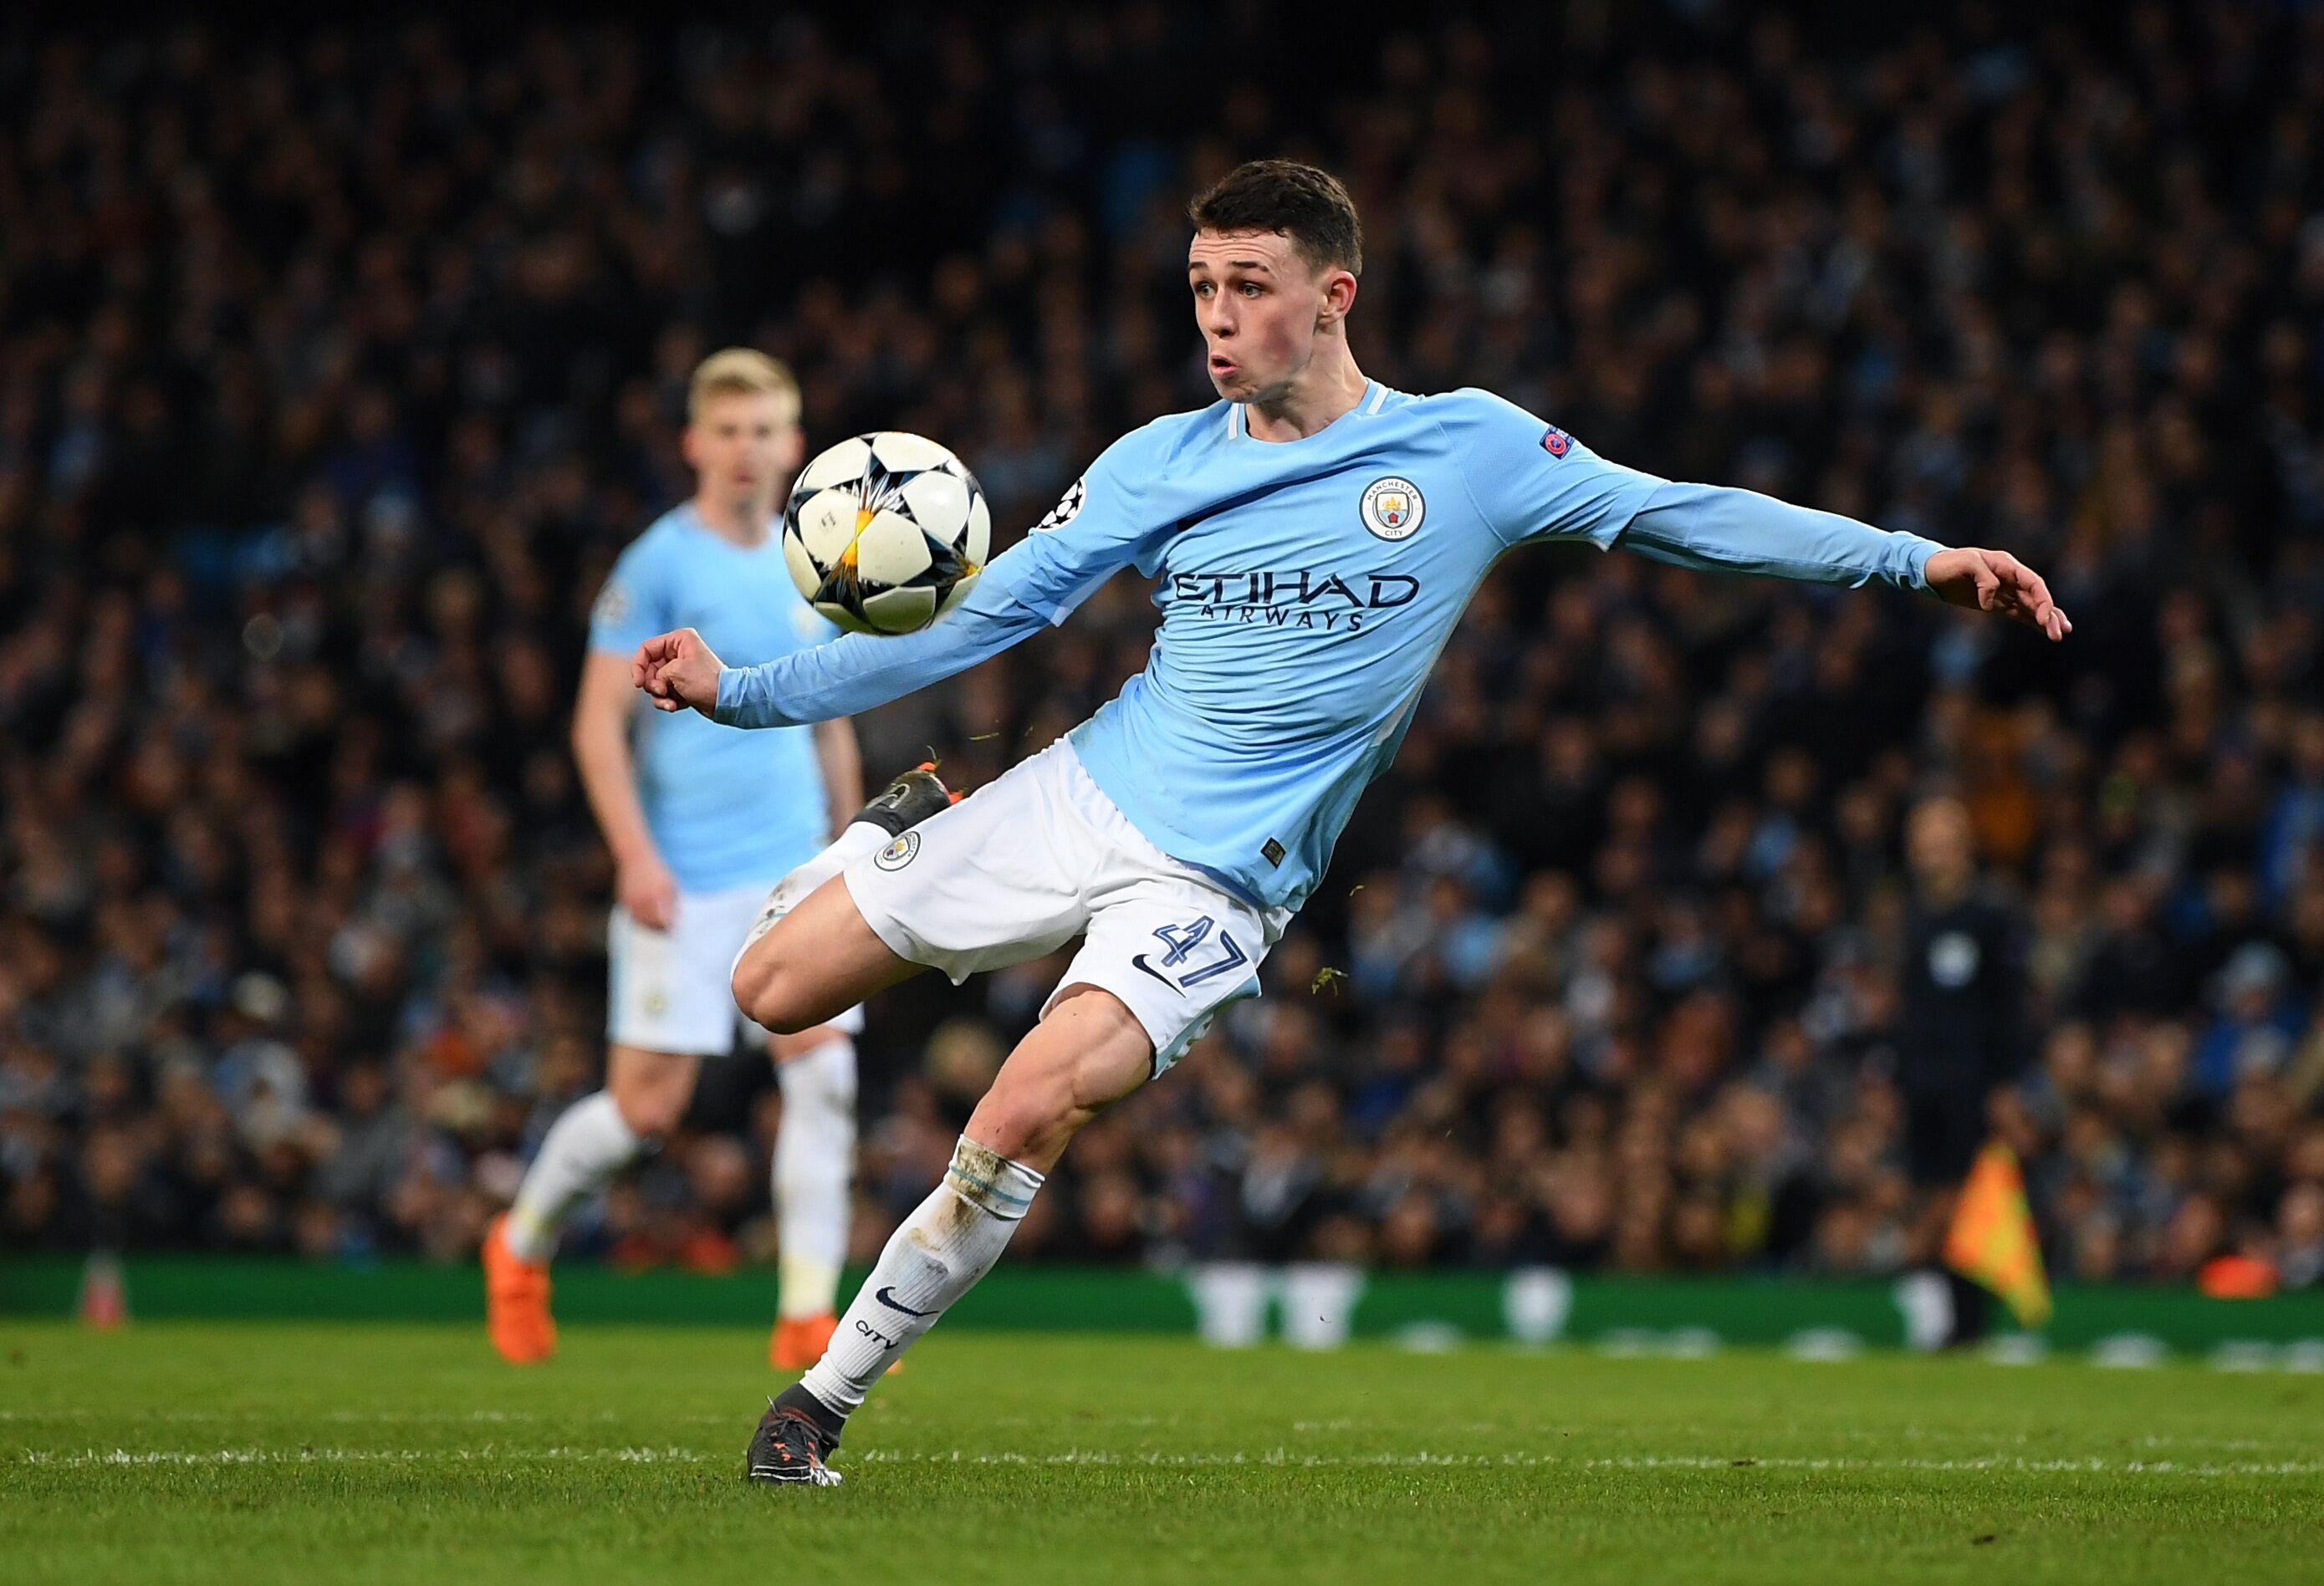 928736568-manchester-city-v-fc-basel-uefa-champions-league-round-of-16-second-leg.jpg